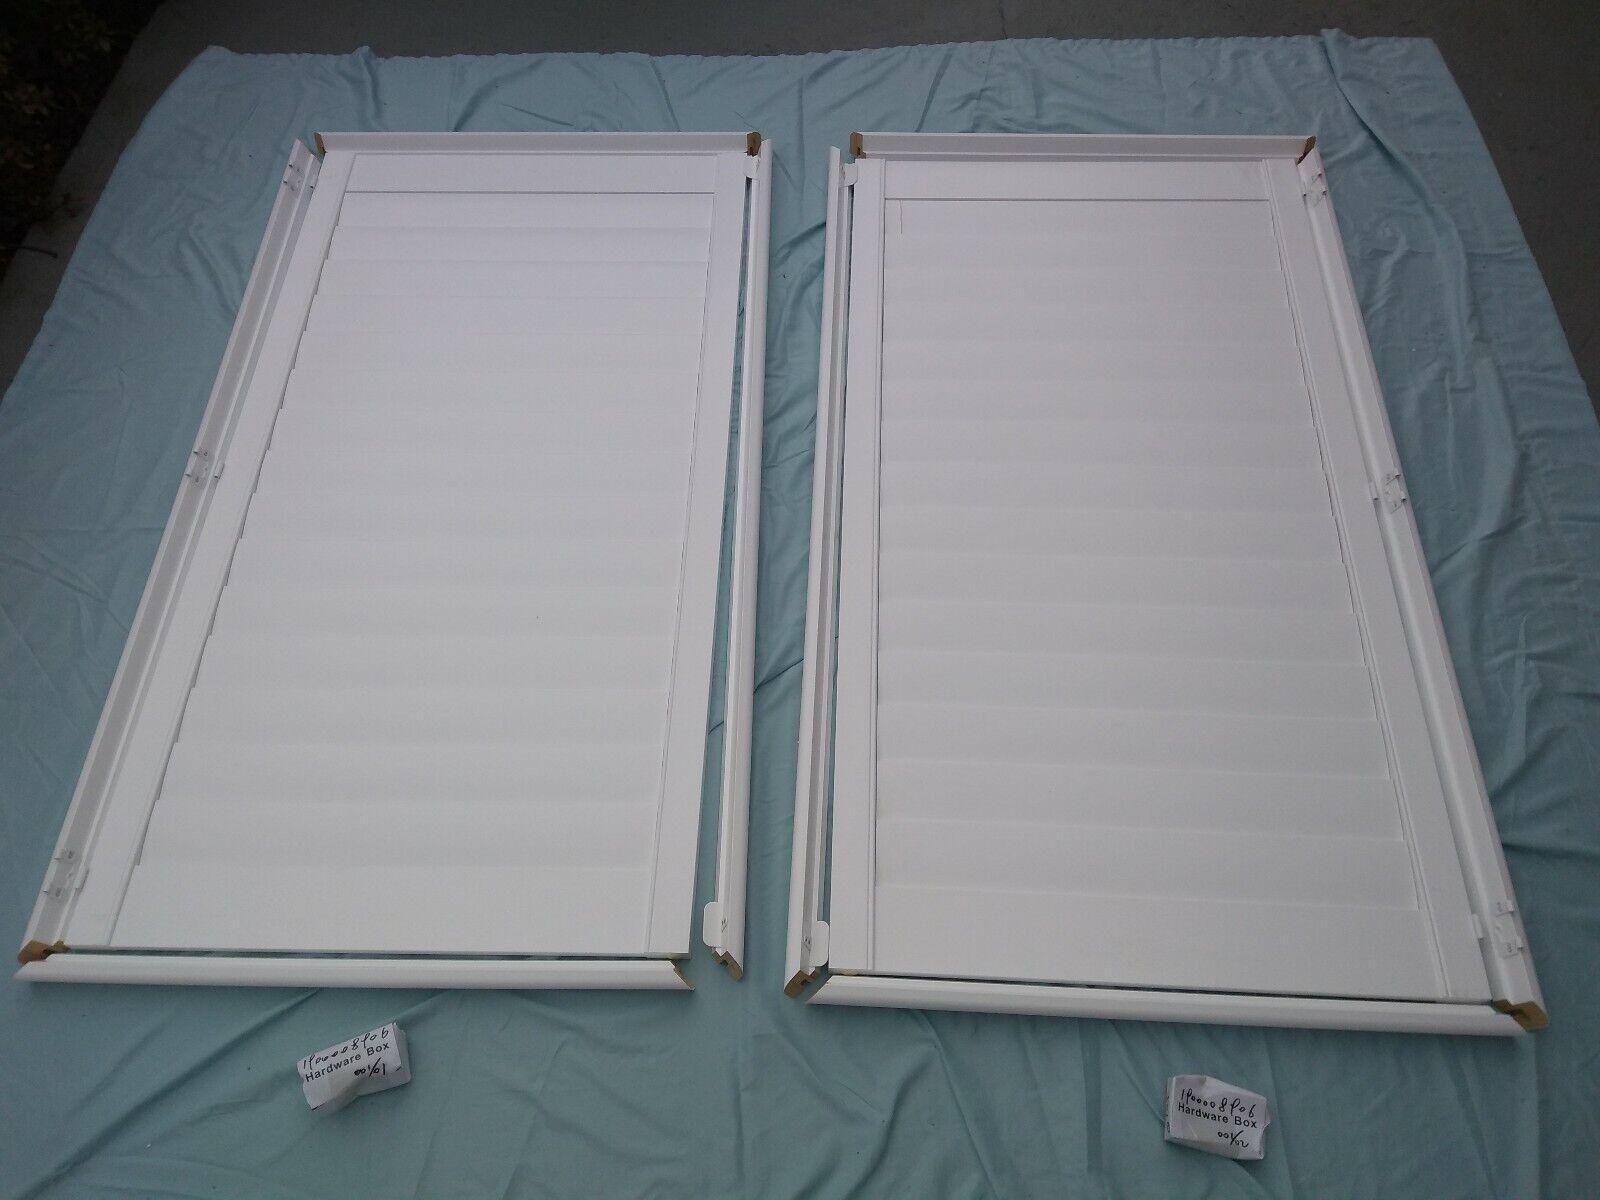 Solid Wood Interior Plantation Shutters 28 9 16  W x 53 1 16  L bianca louvers